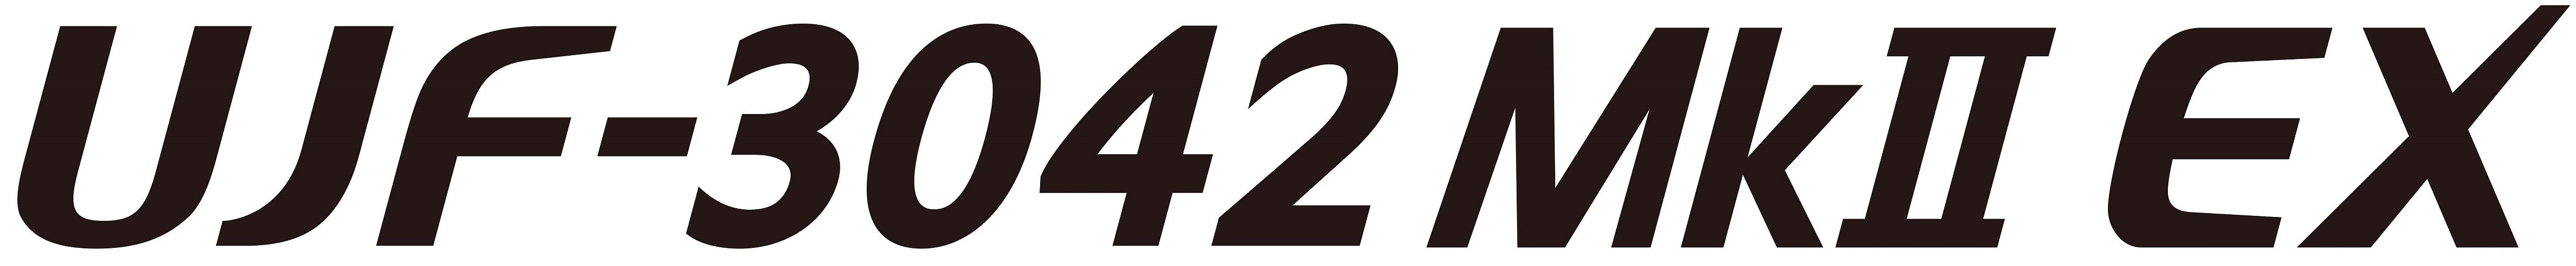 「UJF-3042MkII」「UJF-6042MkII」ロゴ